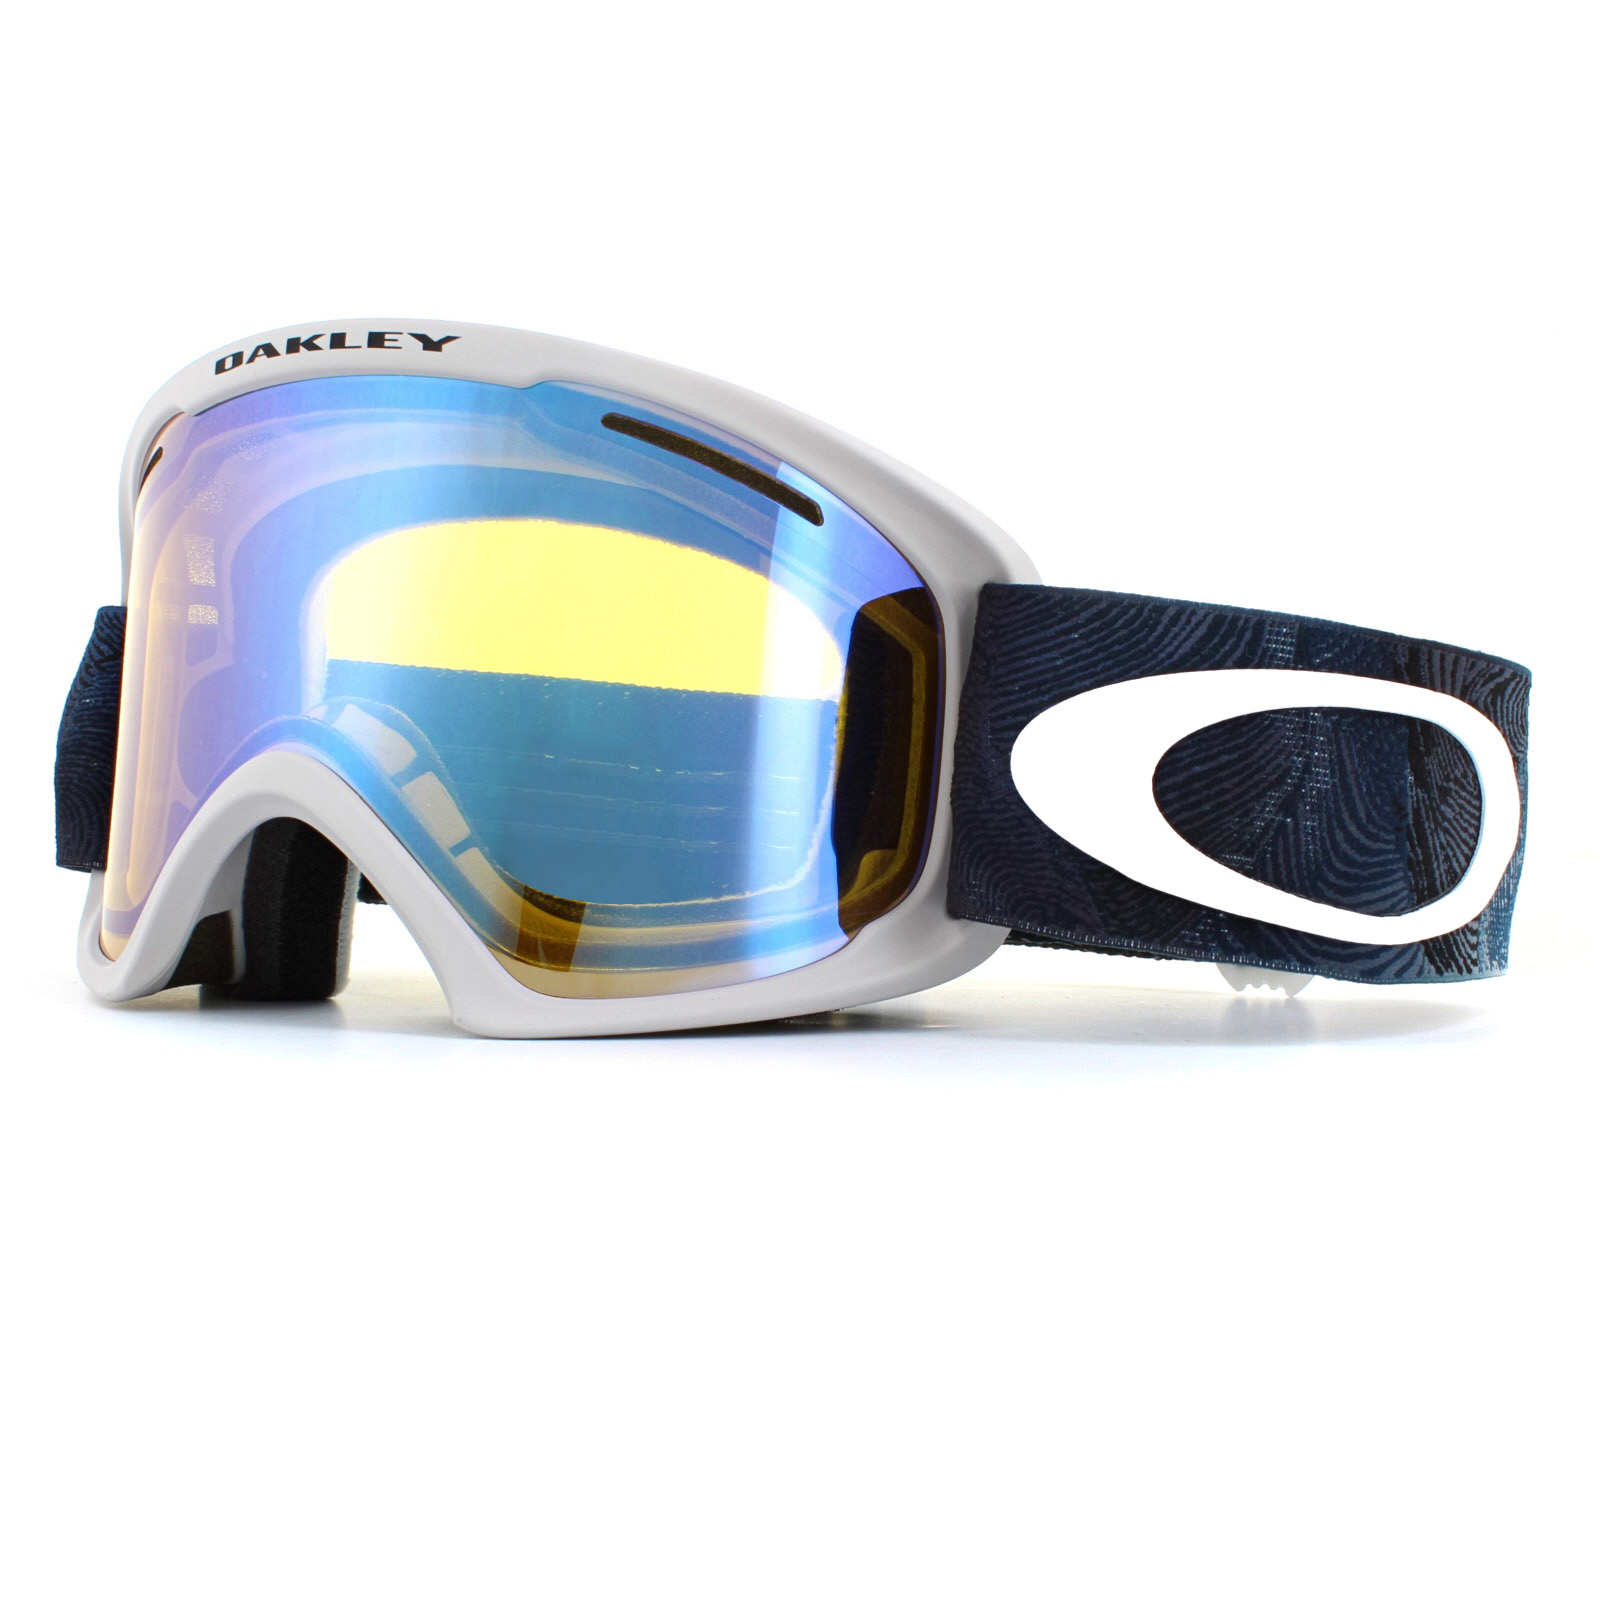 fcb6bc48b3 Sentinel Oakley Ski Goggles O2 XL OO7045-40 Mystic Flow Poseidon Yellow  Iridium